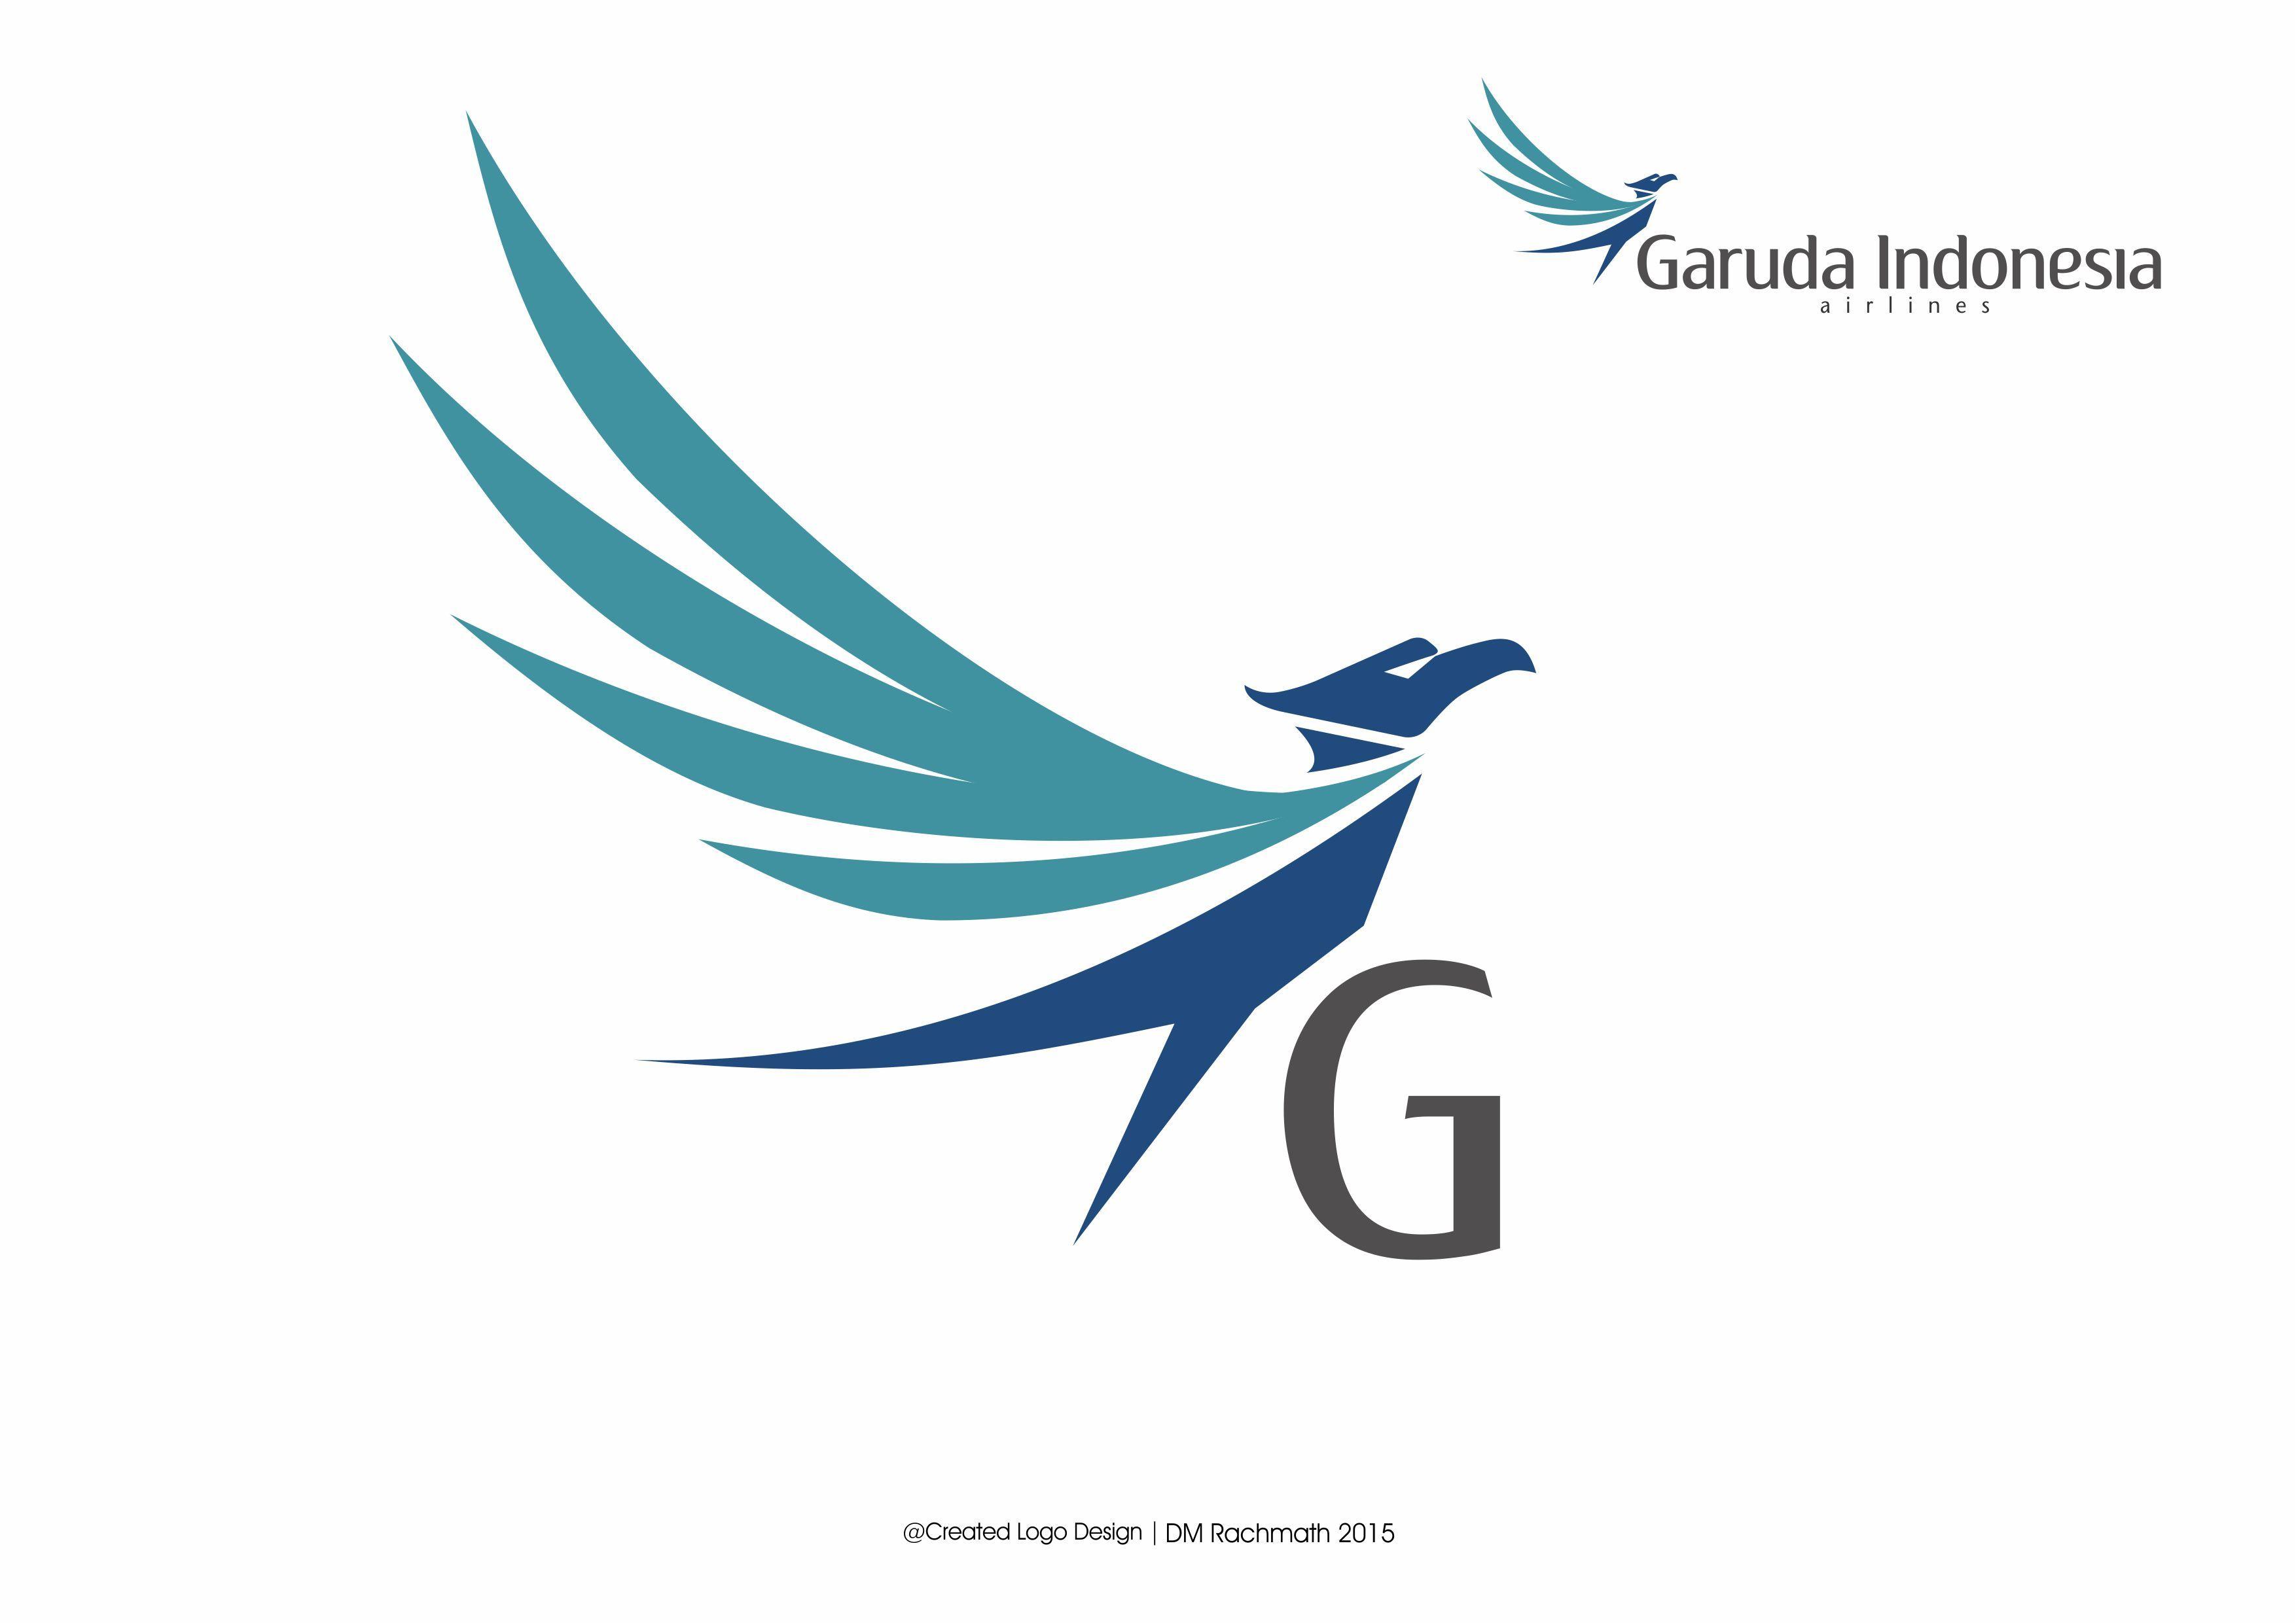 Garuda Indonesia Logo Flying Bird Created By Dm Rachmath Logo Concept Logos Birds Flying